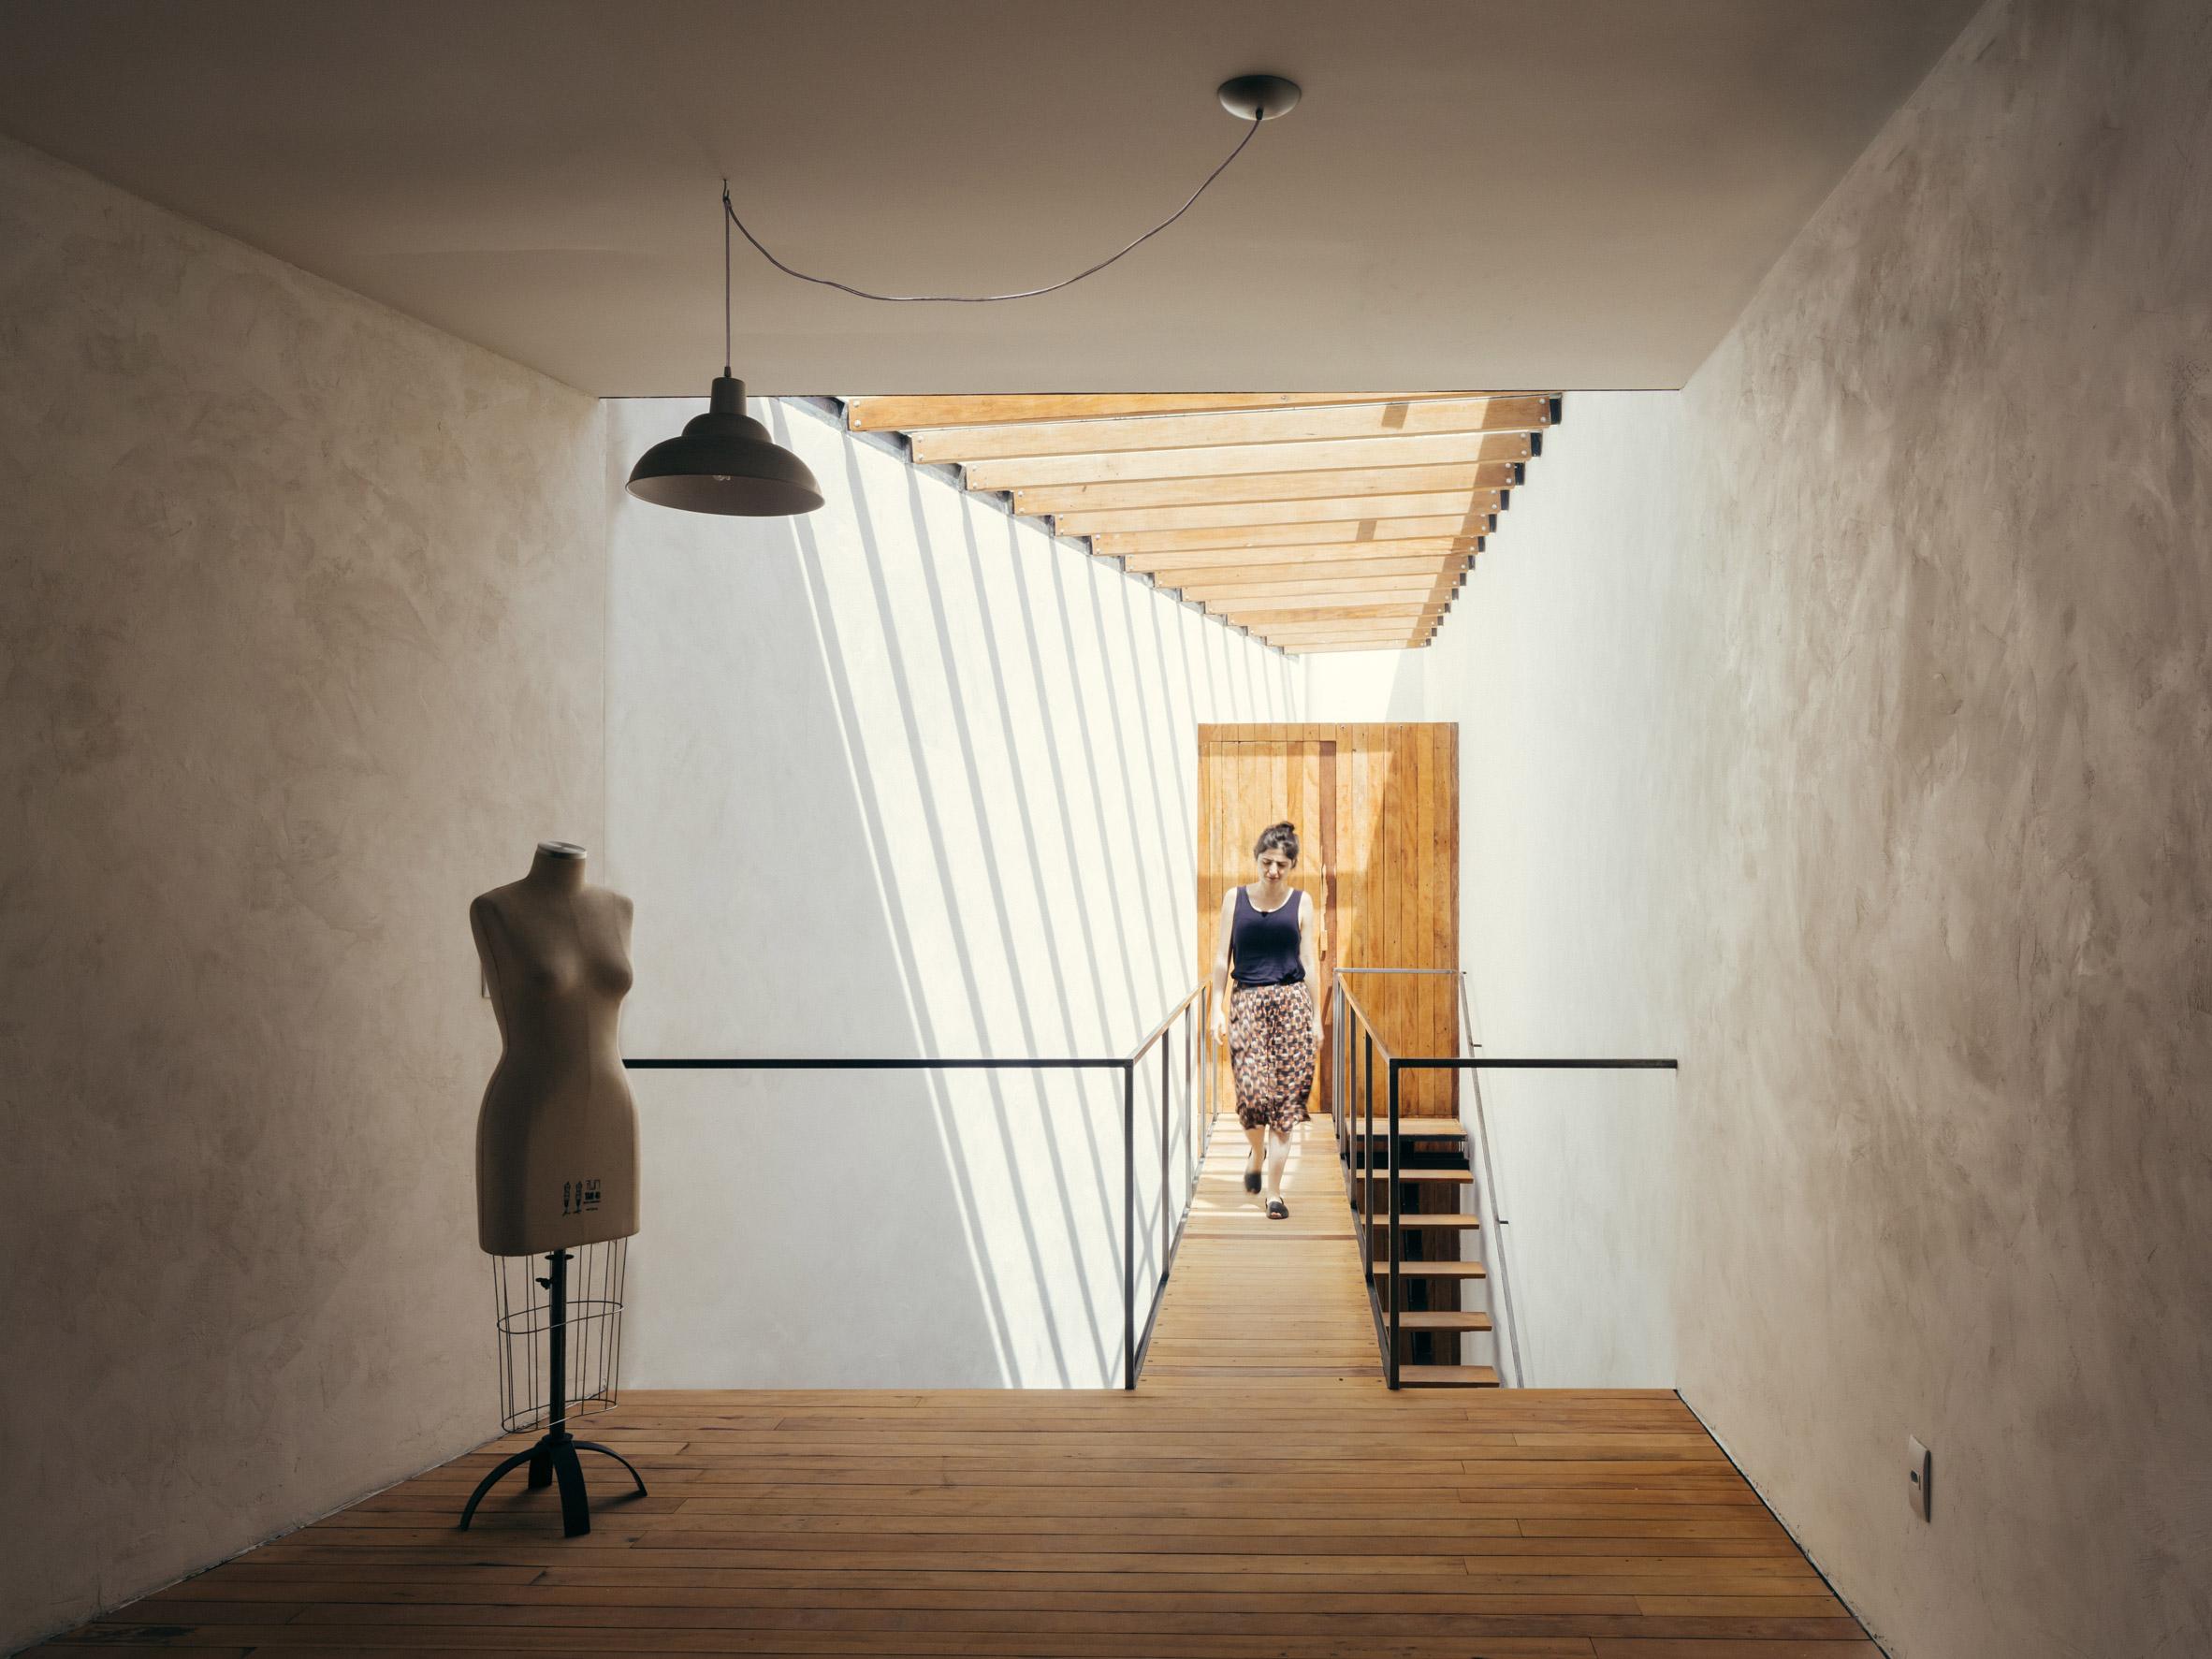 Vão Arquitetura organises São Paulo boutique around indoor garden